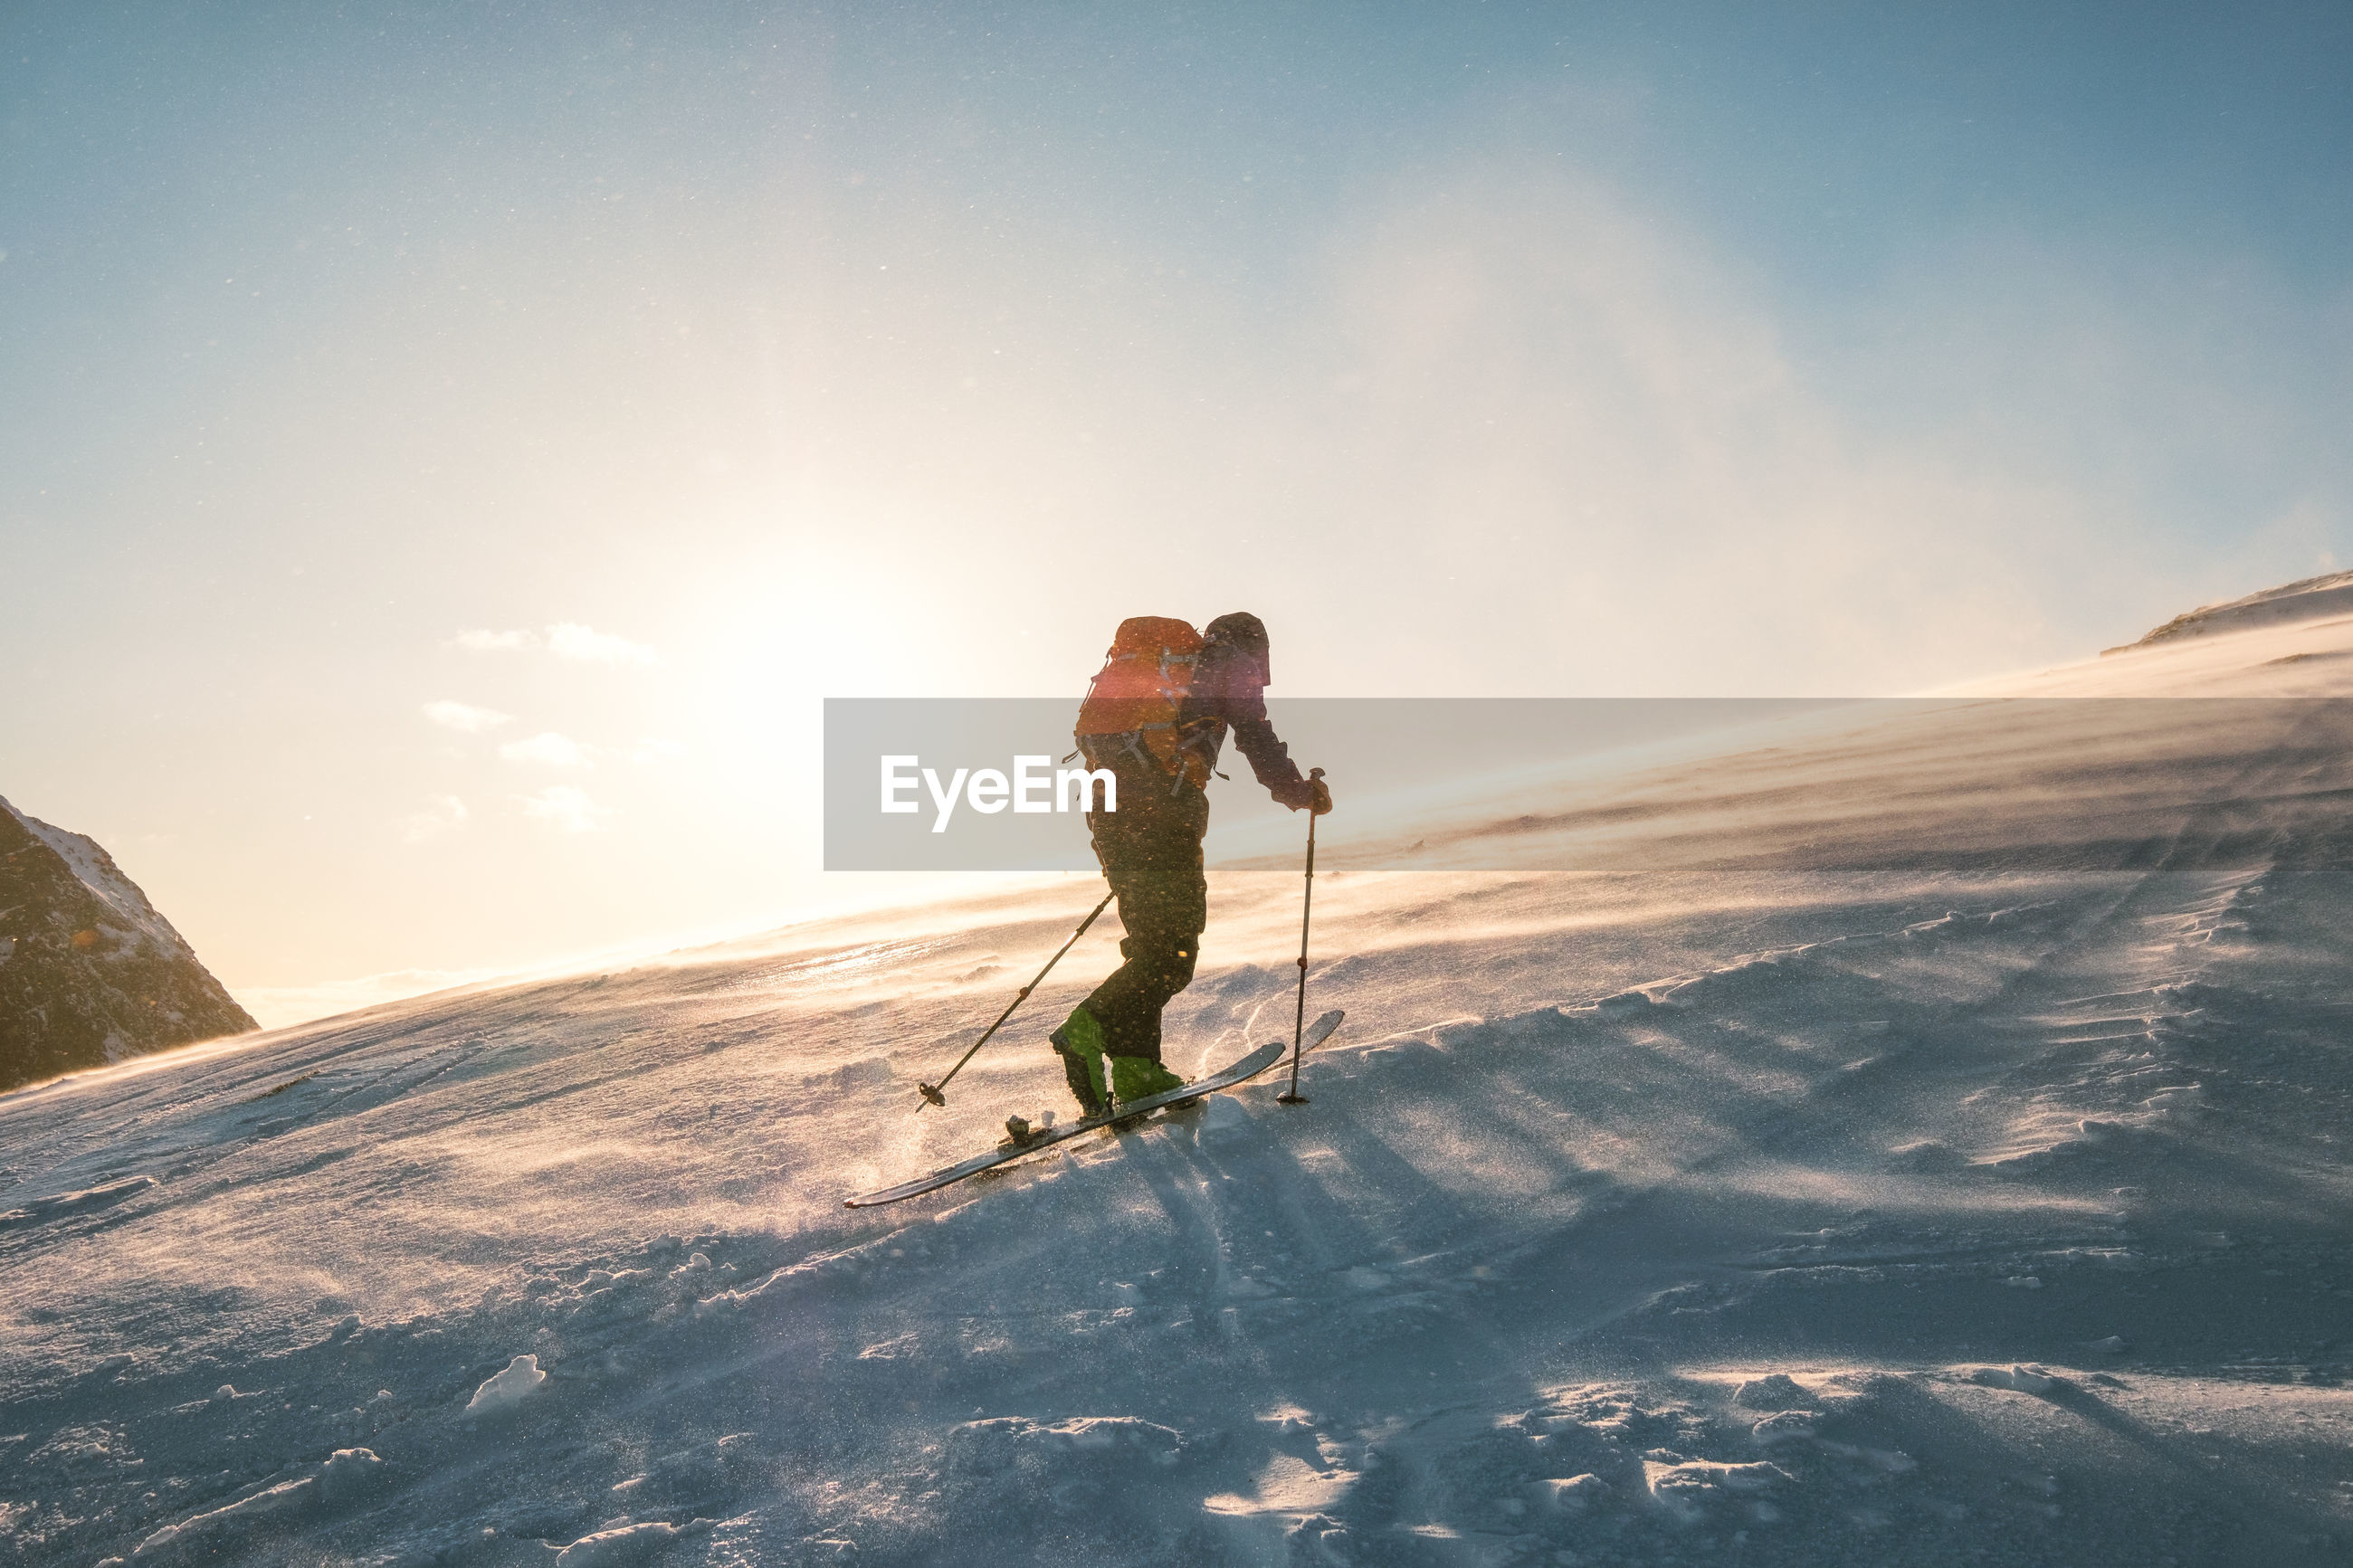 MAN SKIING ON MOUNTAIN DURING WINTER